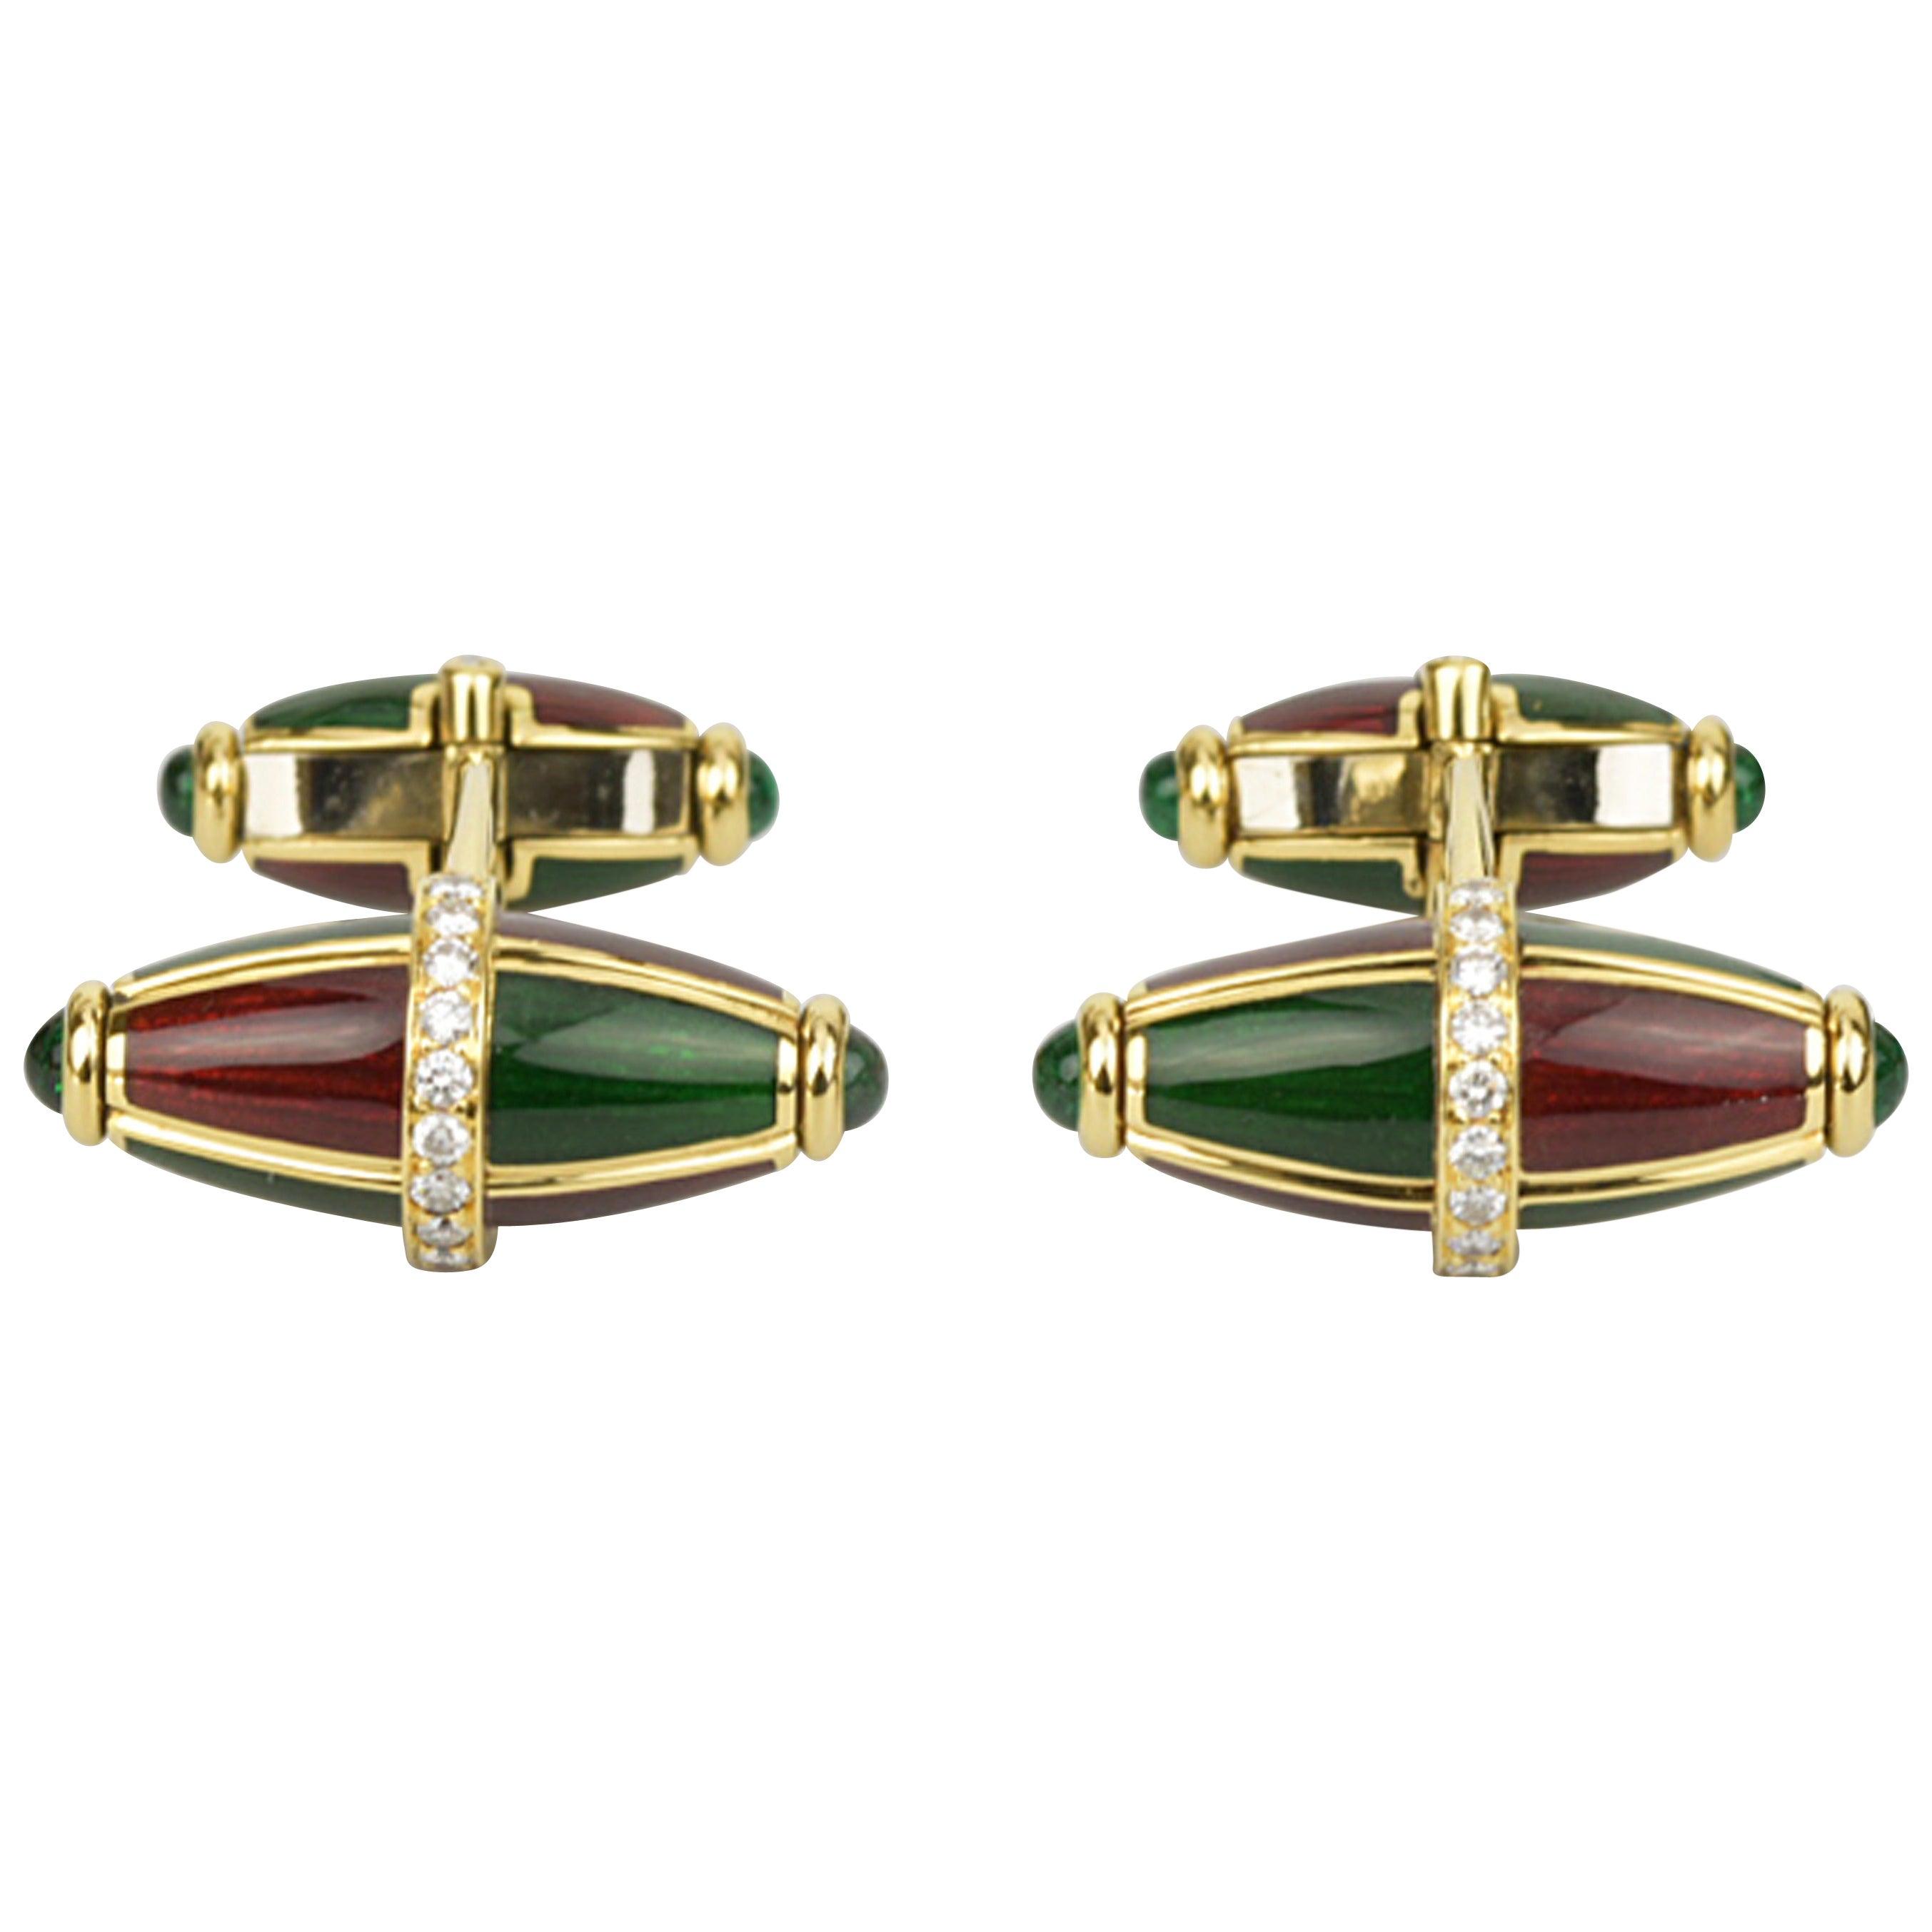 Matthew Cambery 18 Karat Yellow Gold Enamel Diamond Emerald Cabochon Cufflinks